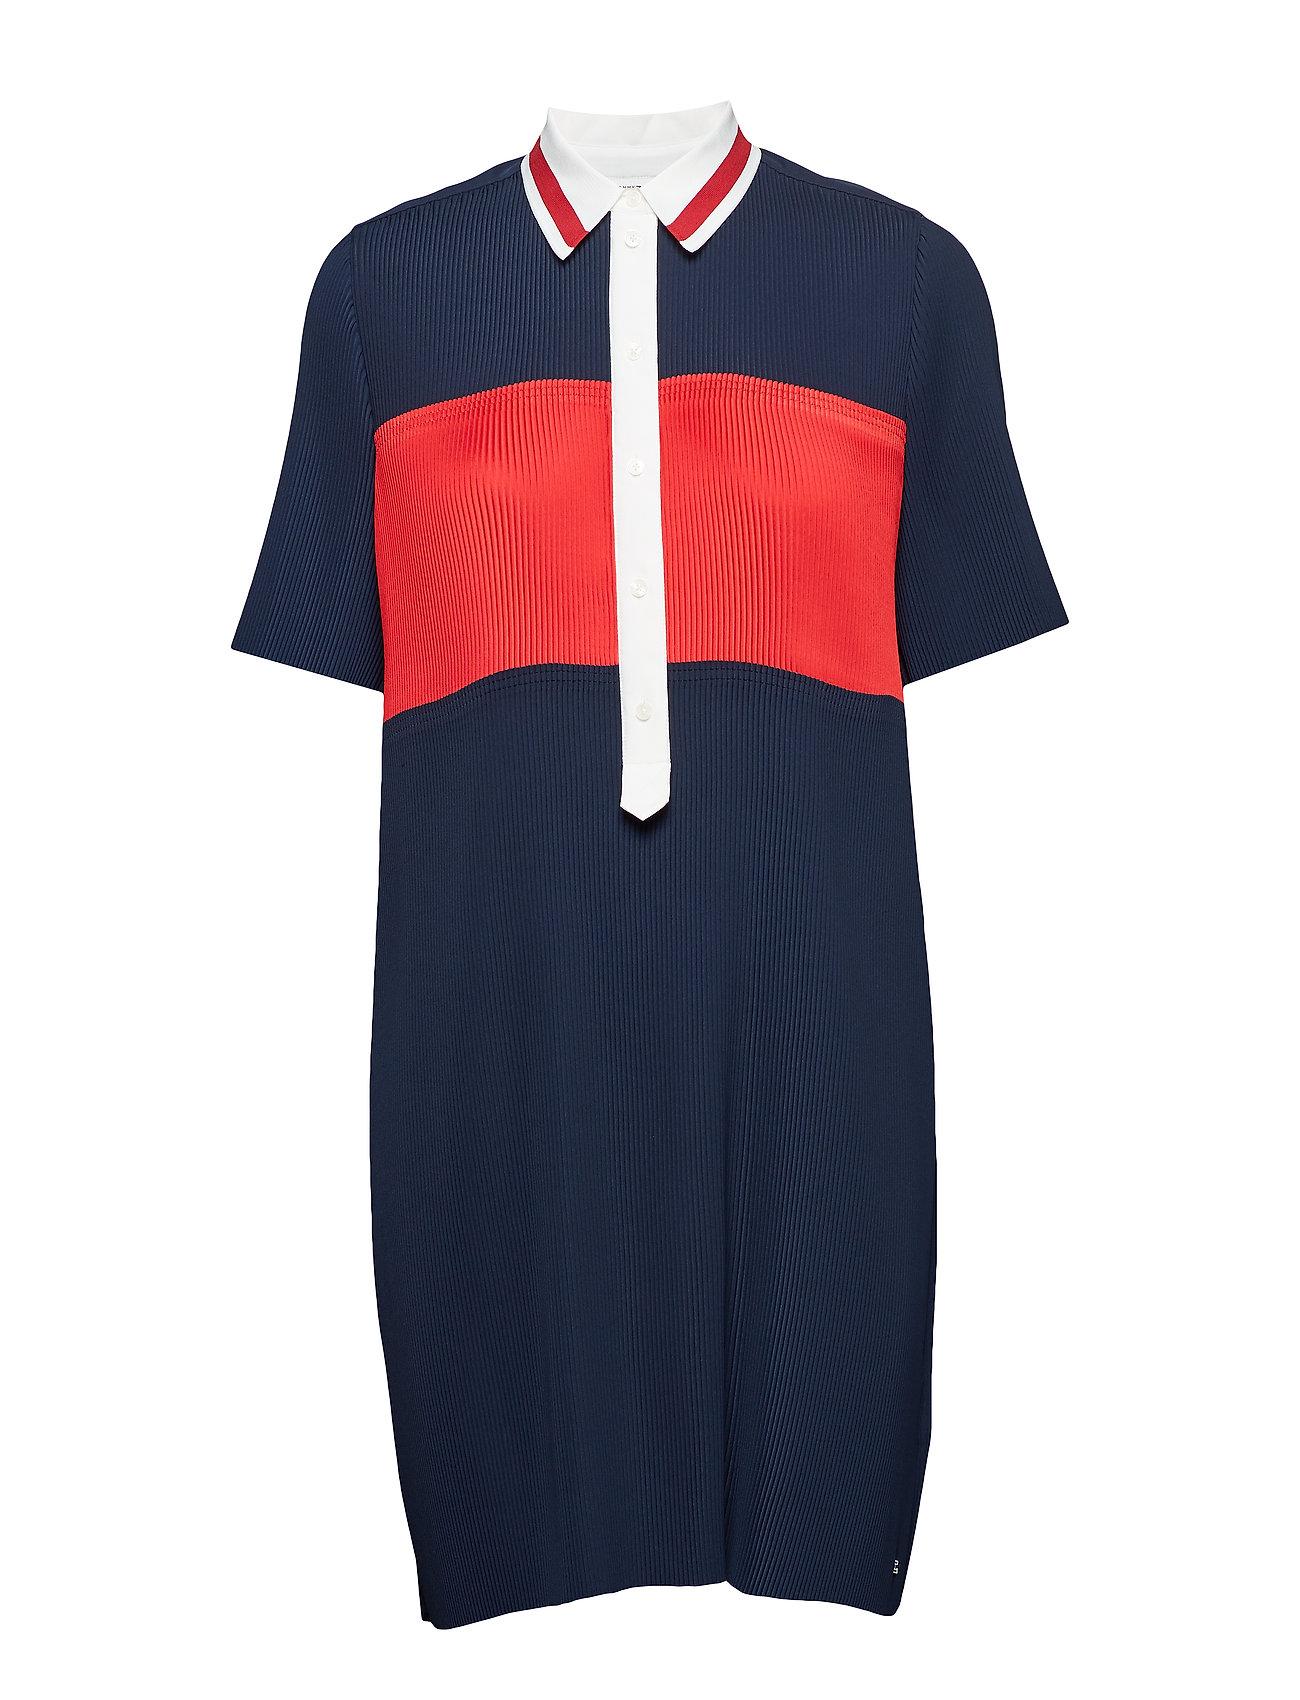 Tommy Hilfiger FRANCES DRESS SS, 40 - MIDNIGHT